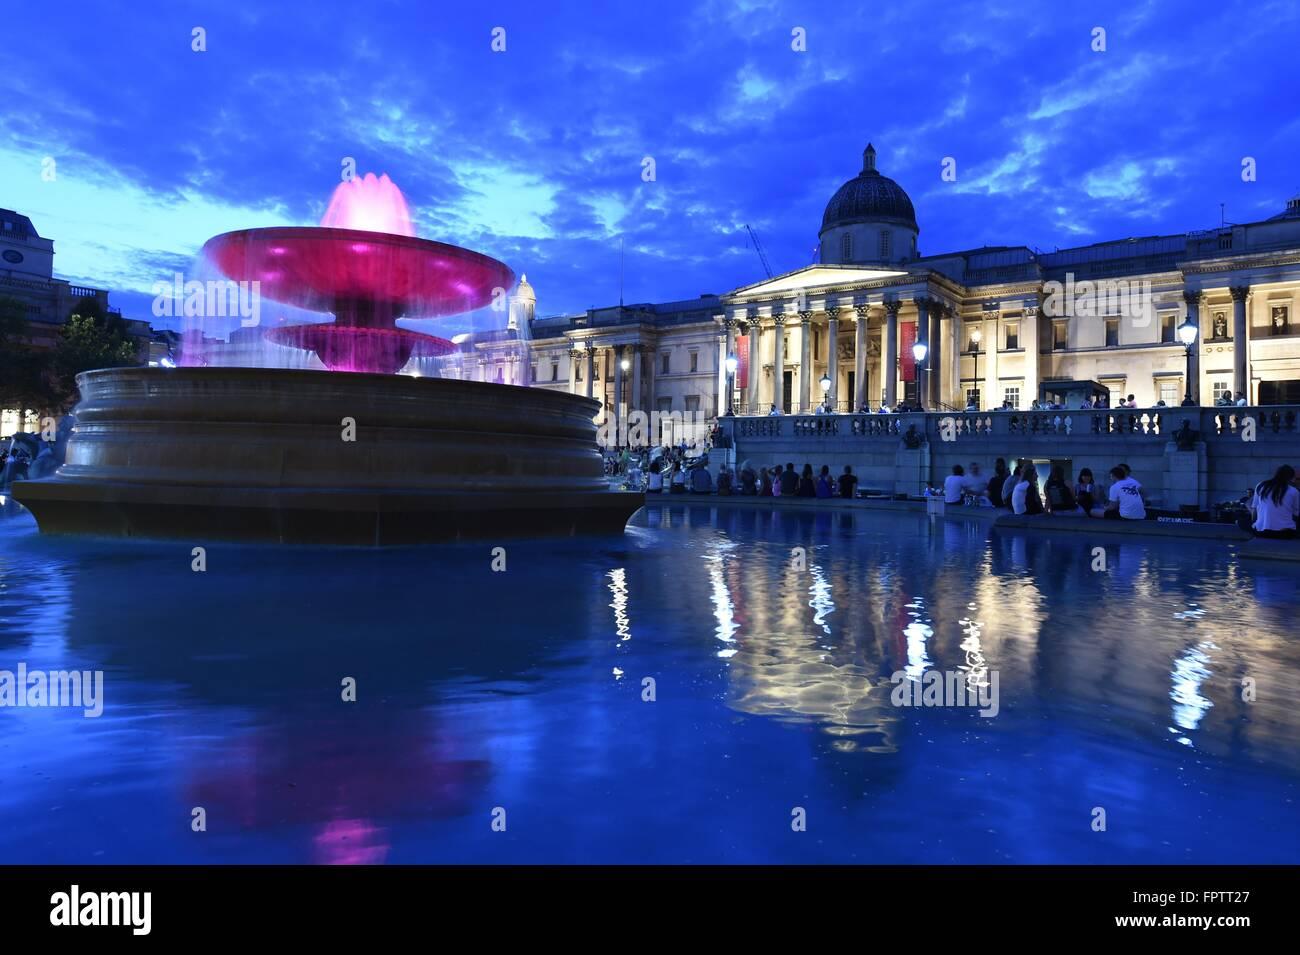 National Gallery, Trafalgar Square, art gallery in London, UK, - Stock Image